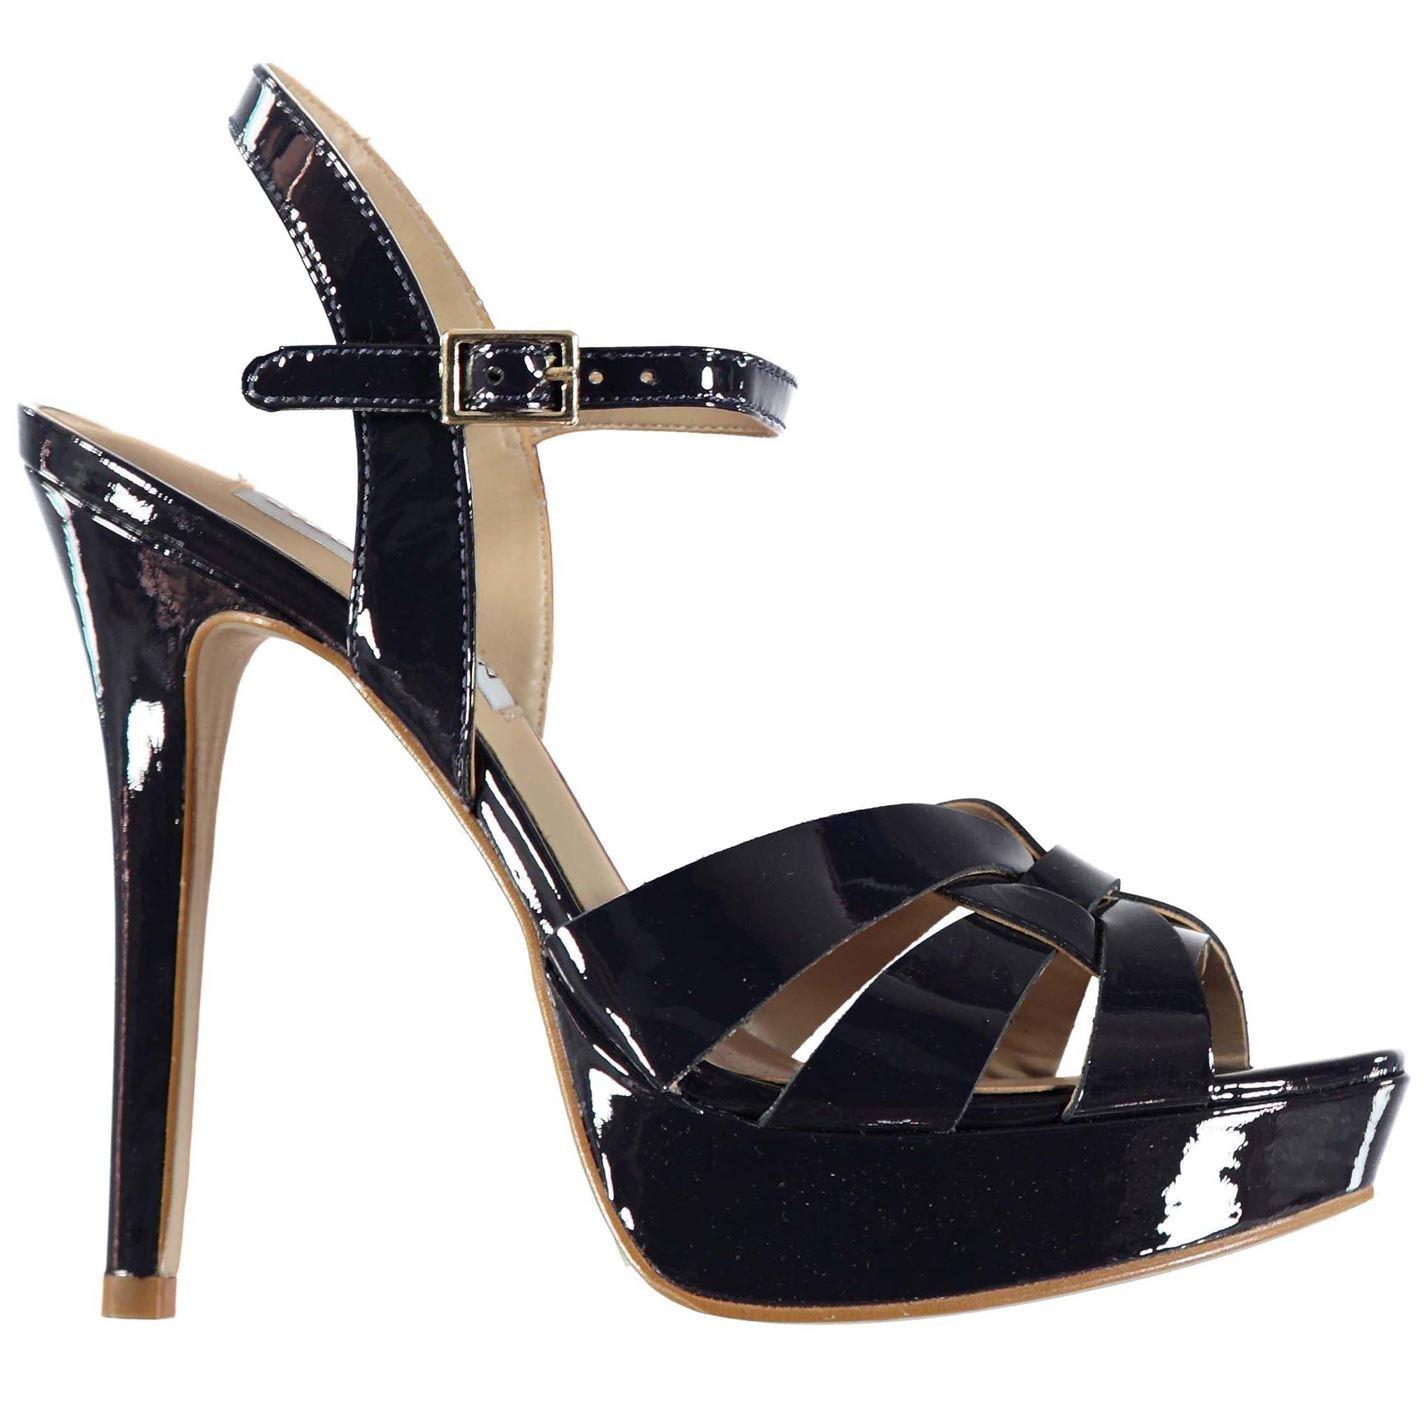 Steve-Madden-Womens-Kaiden-5-Inch-Stiletto-Heeled-